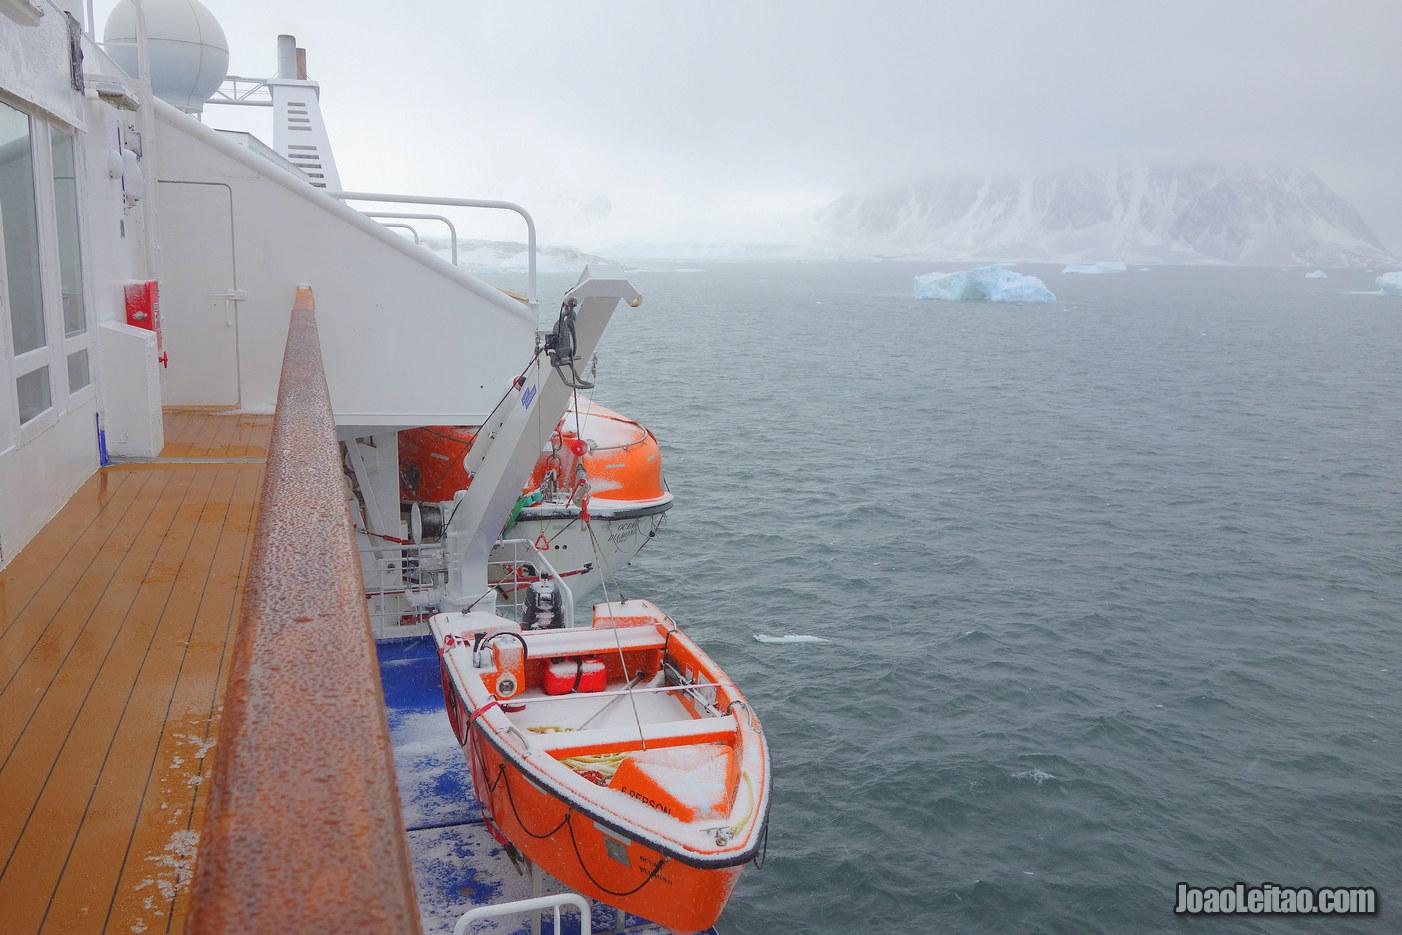 Adelaide Island in Antarctica